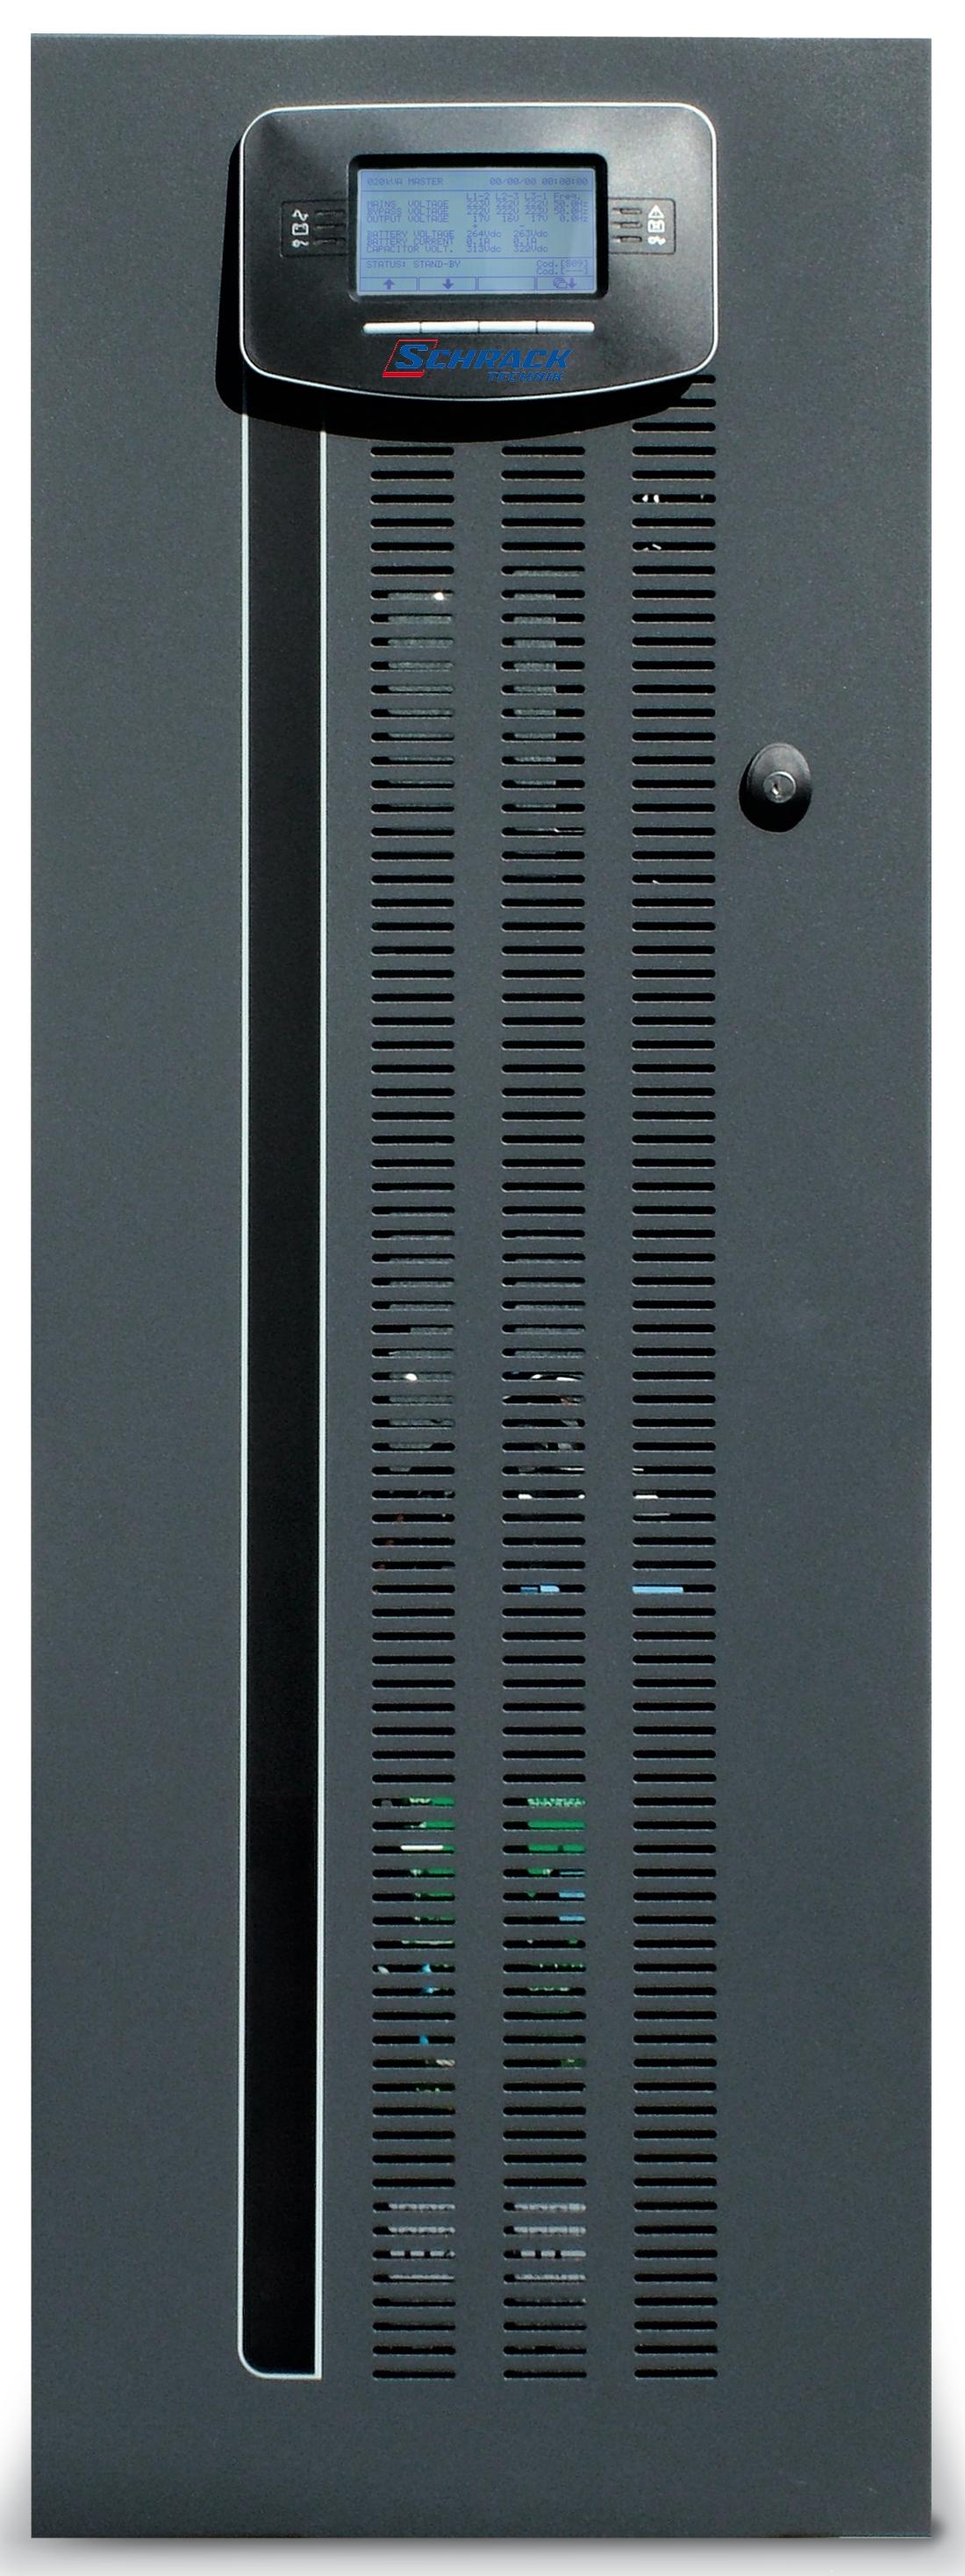 1 Stk USV AVARA Multi 12kVA 10,8kW 9Min. 3ph/3ph /Online USMLT12XA3